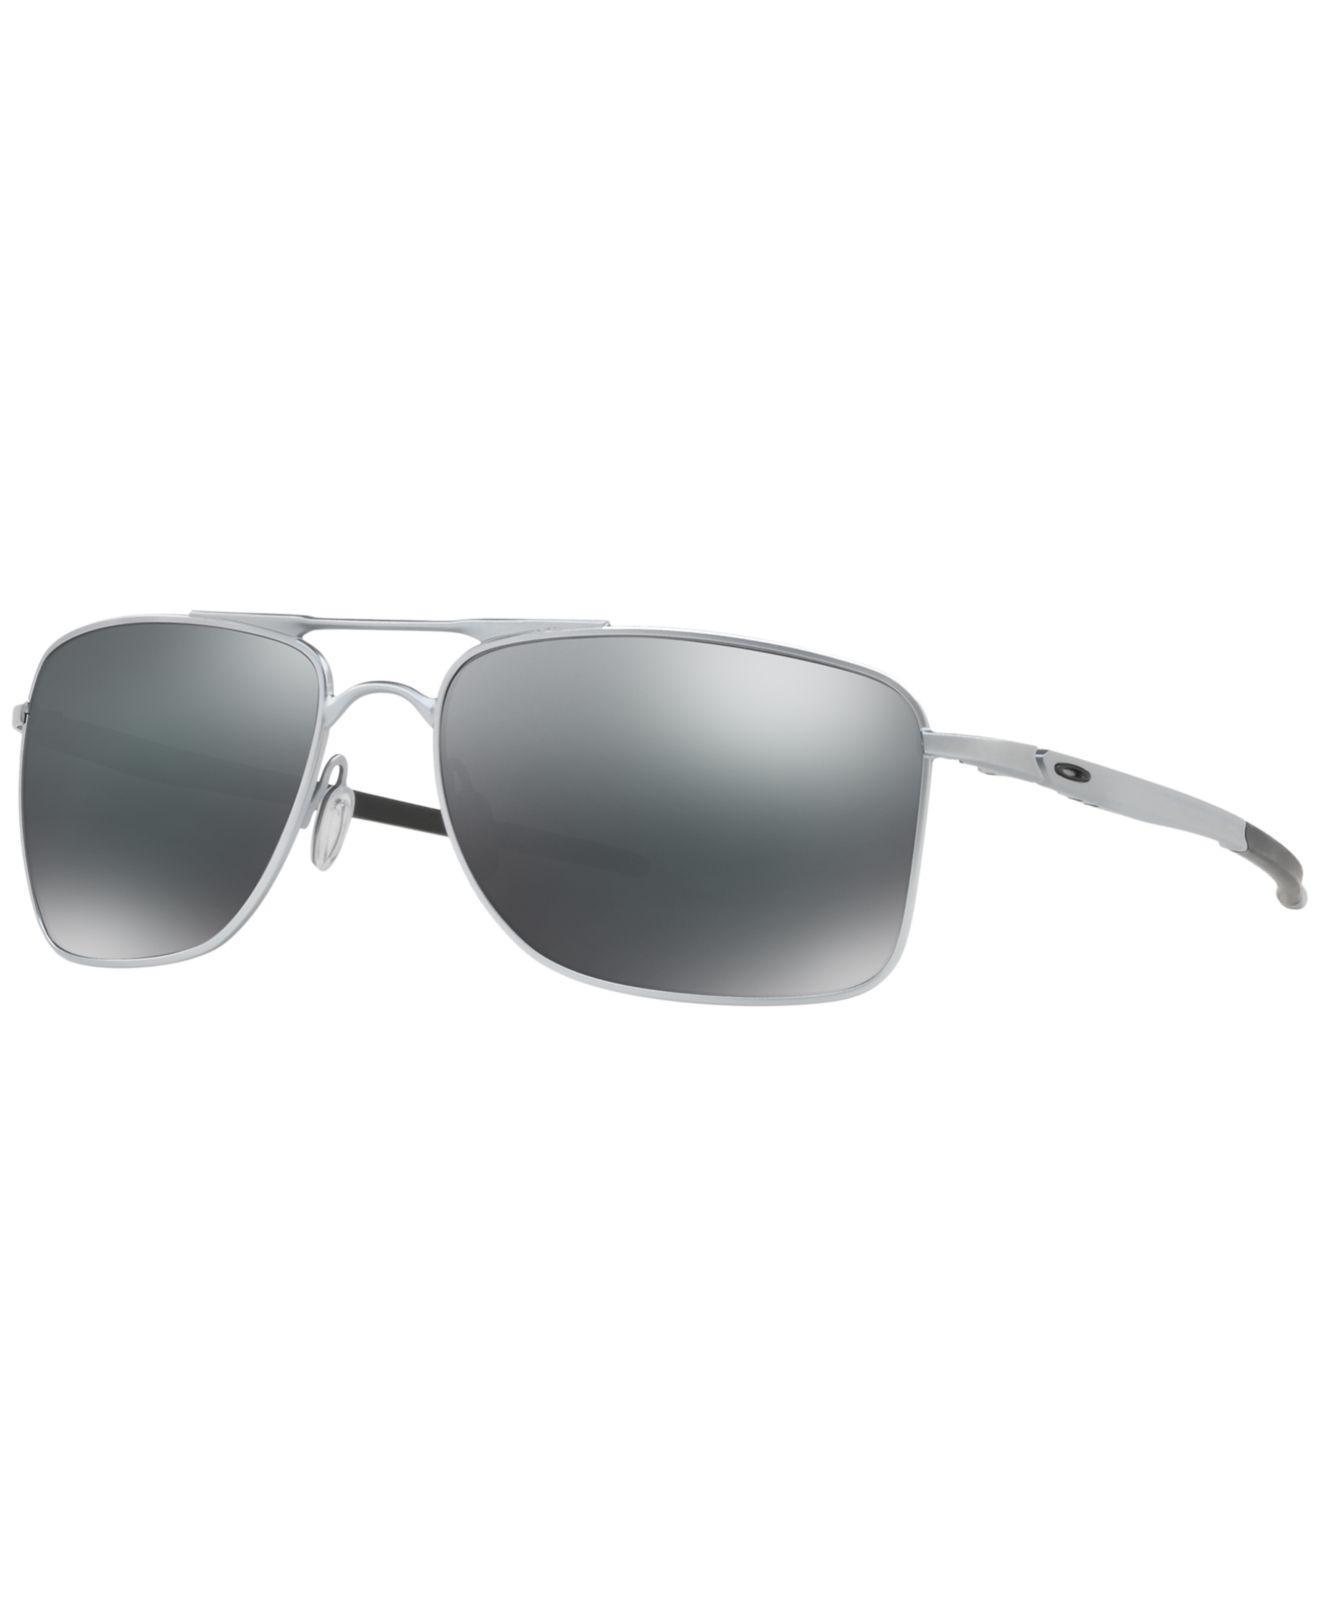 578506c8a1 greece macys oakley sunglasses gascan uk 07df6 e4844